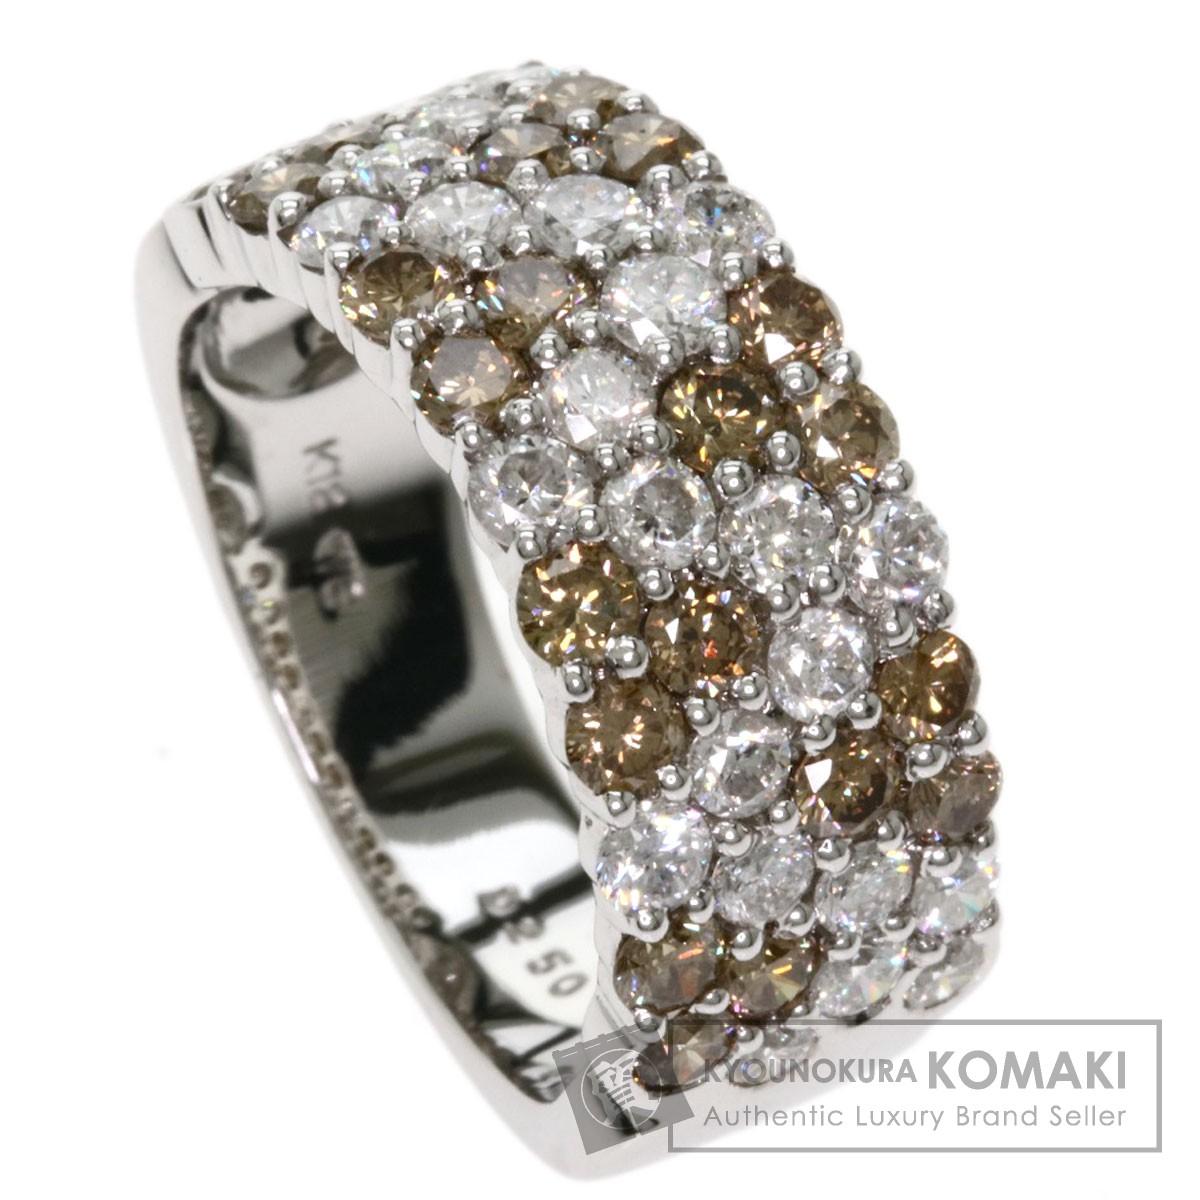 2.5ct ダイヤモンド リング・指輪 K18ホワイトゴールド 9.2g レディース 【中古】